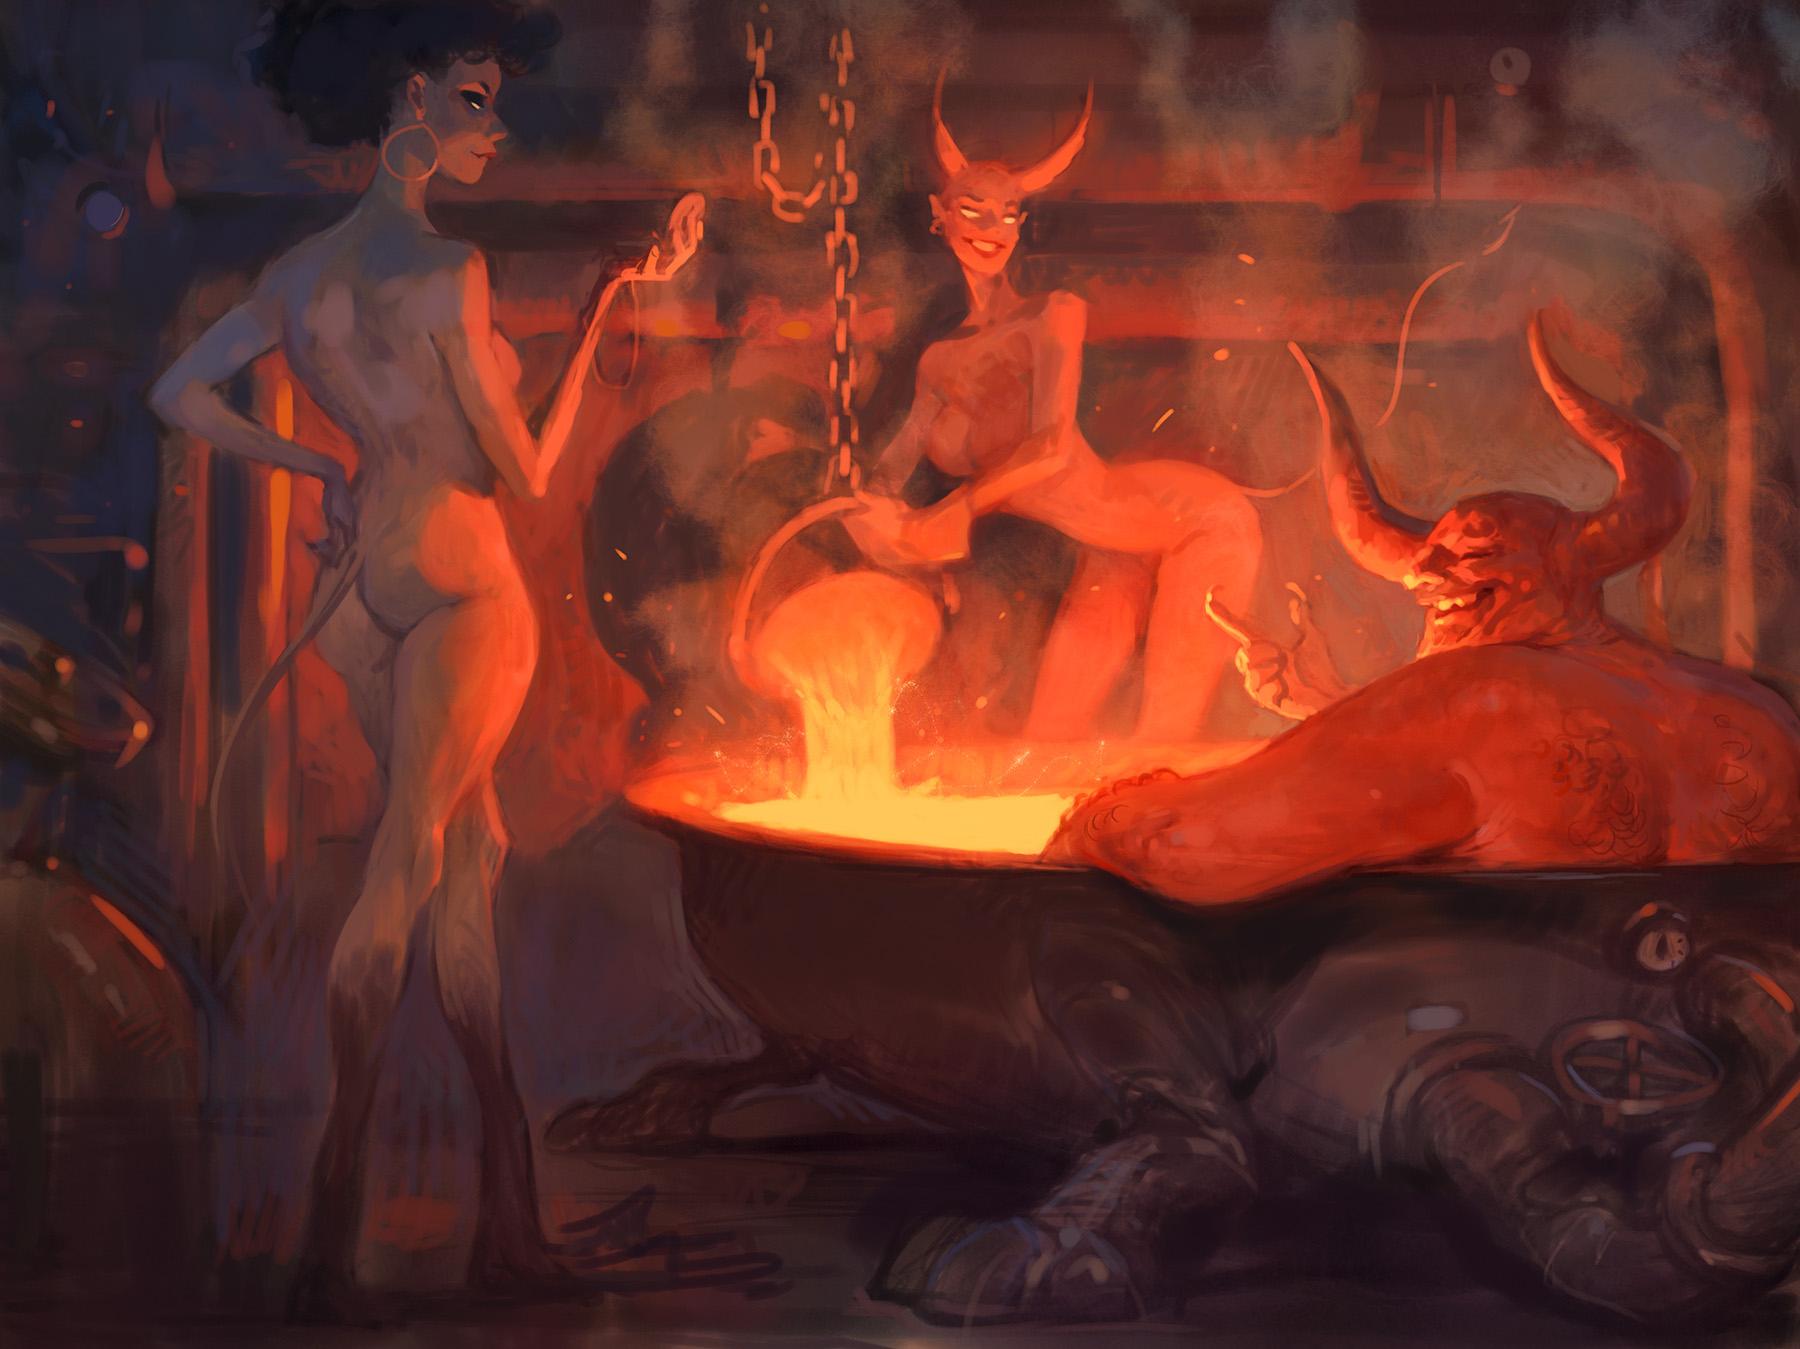 Demon_bath.jpg